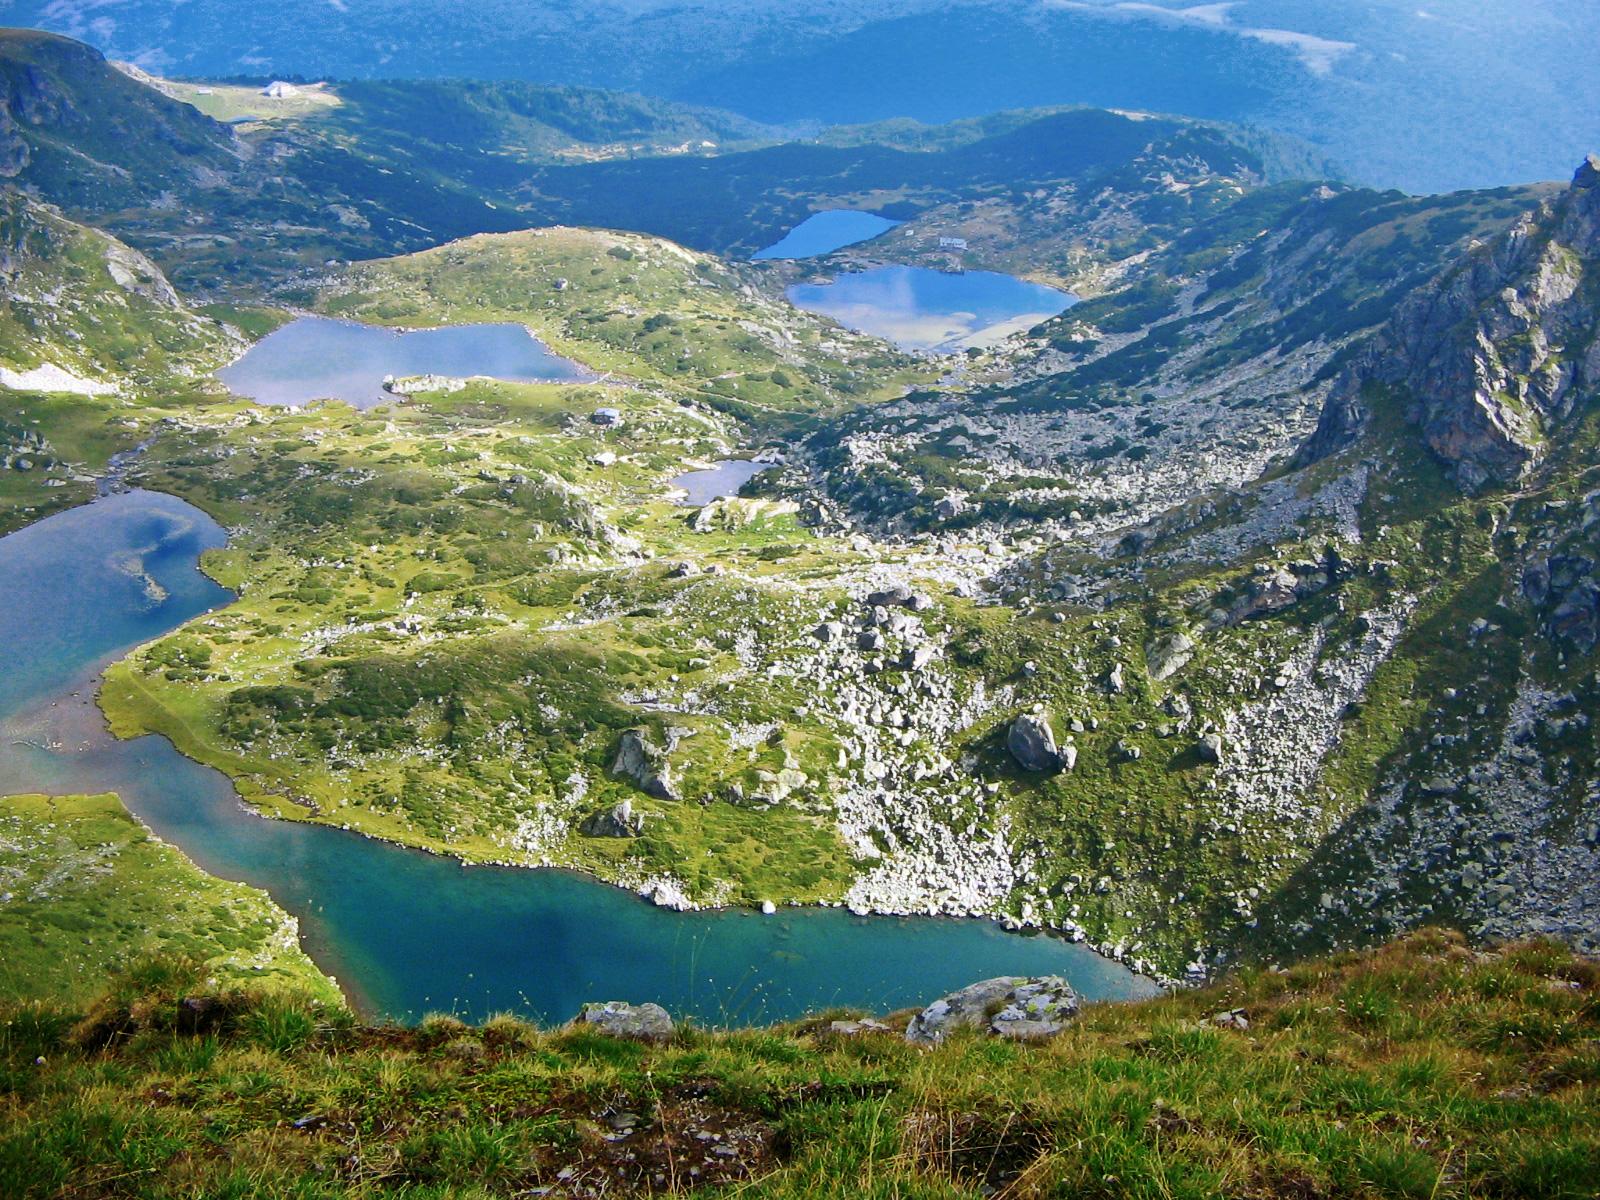 Les 7 lacs du Rila, Bulgarie